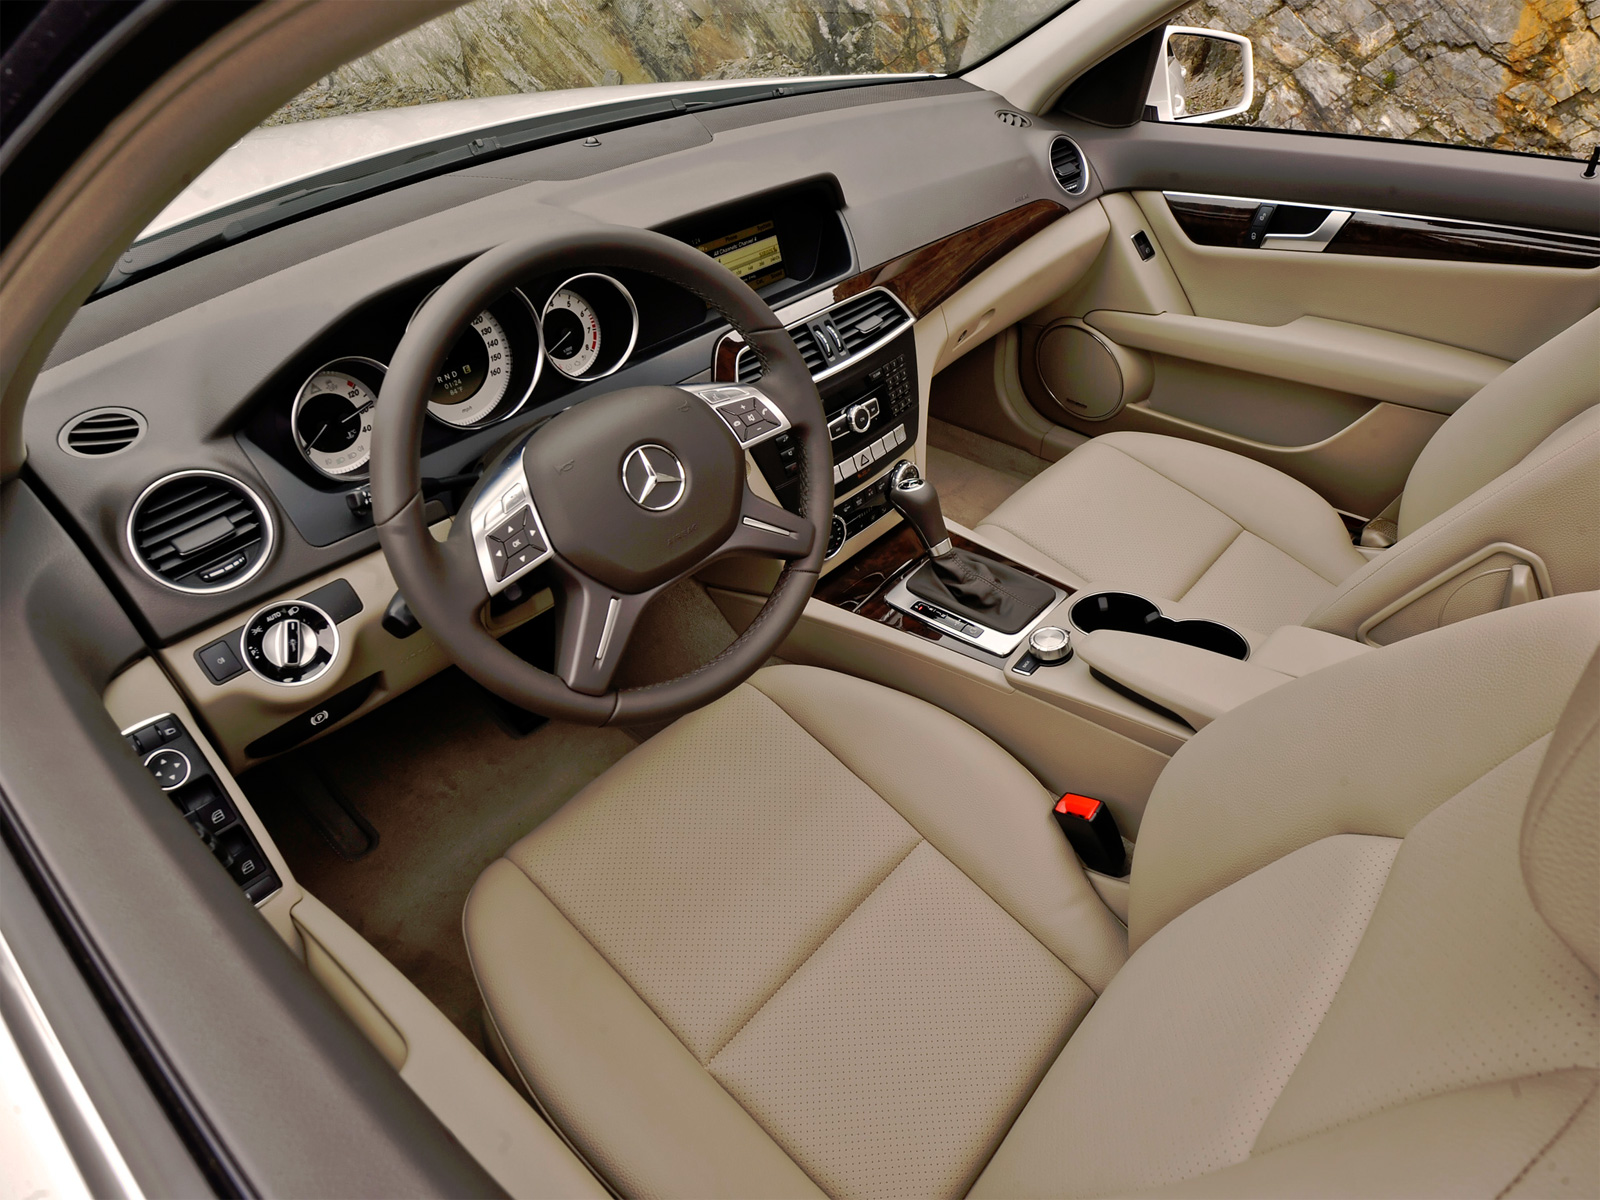 Mercedes-Benz C-class (2007-2014) характеристики и цены